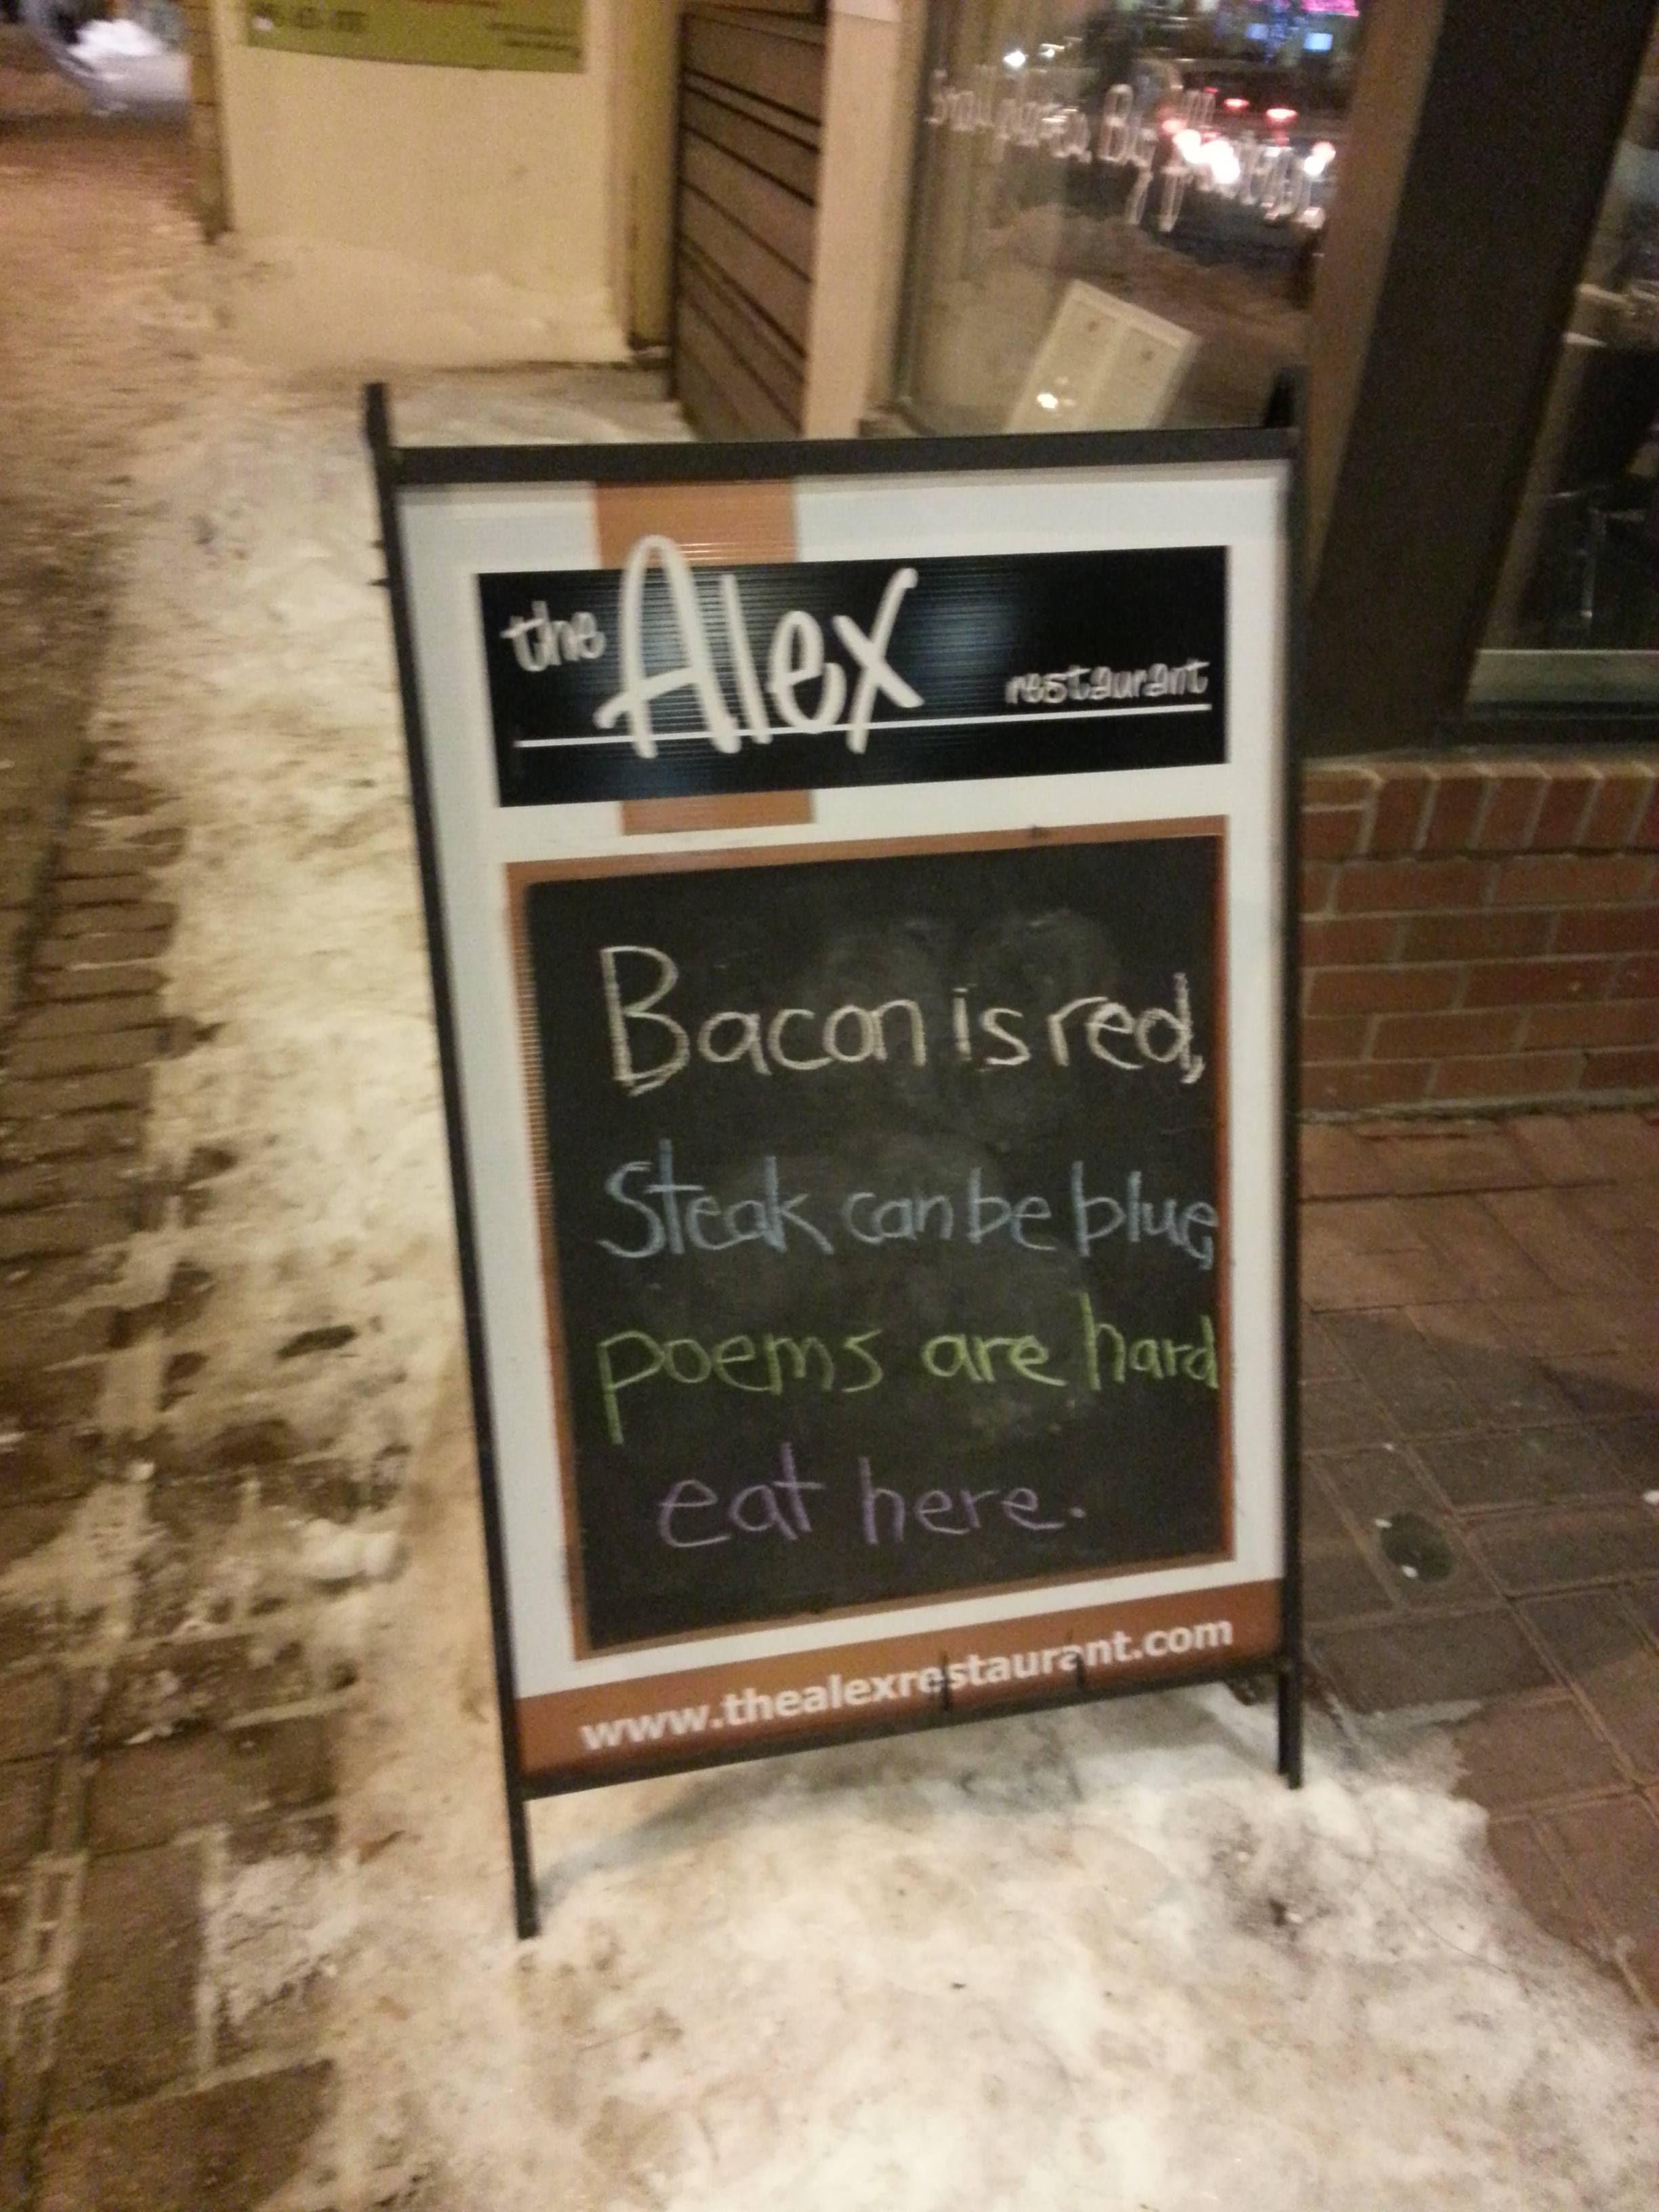 18 Funny Restaurant Signs